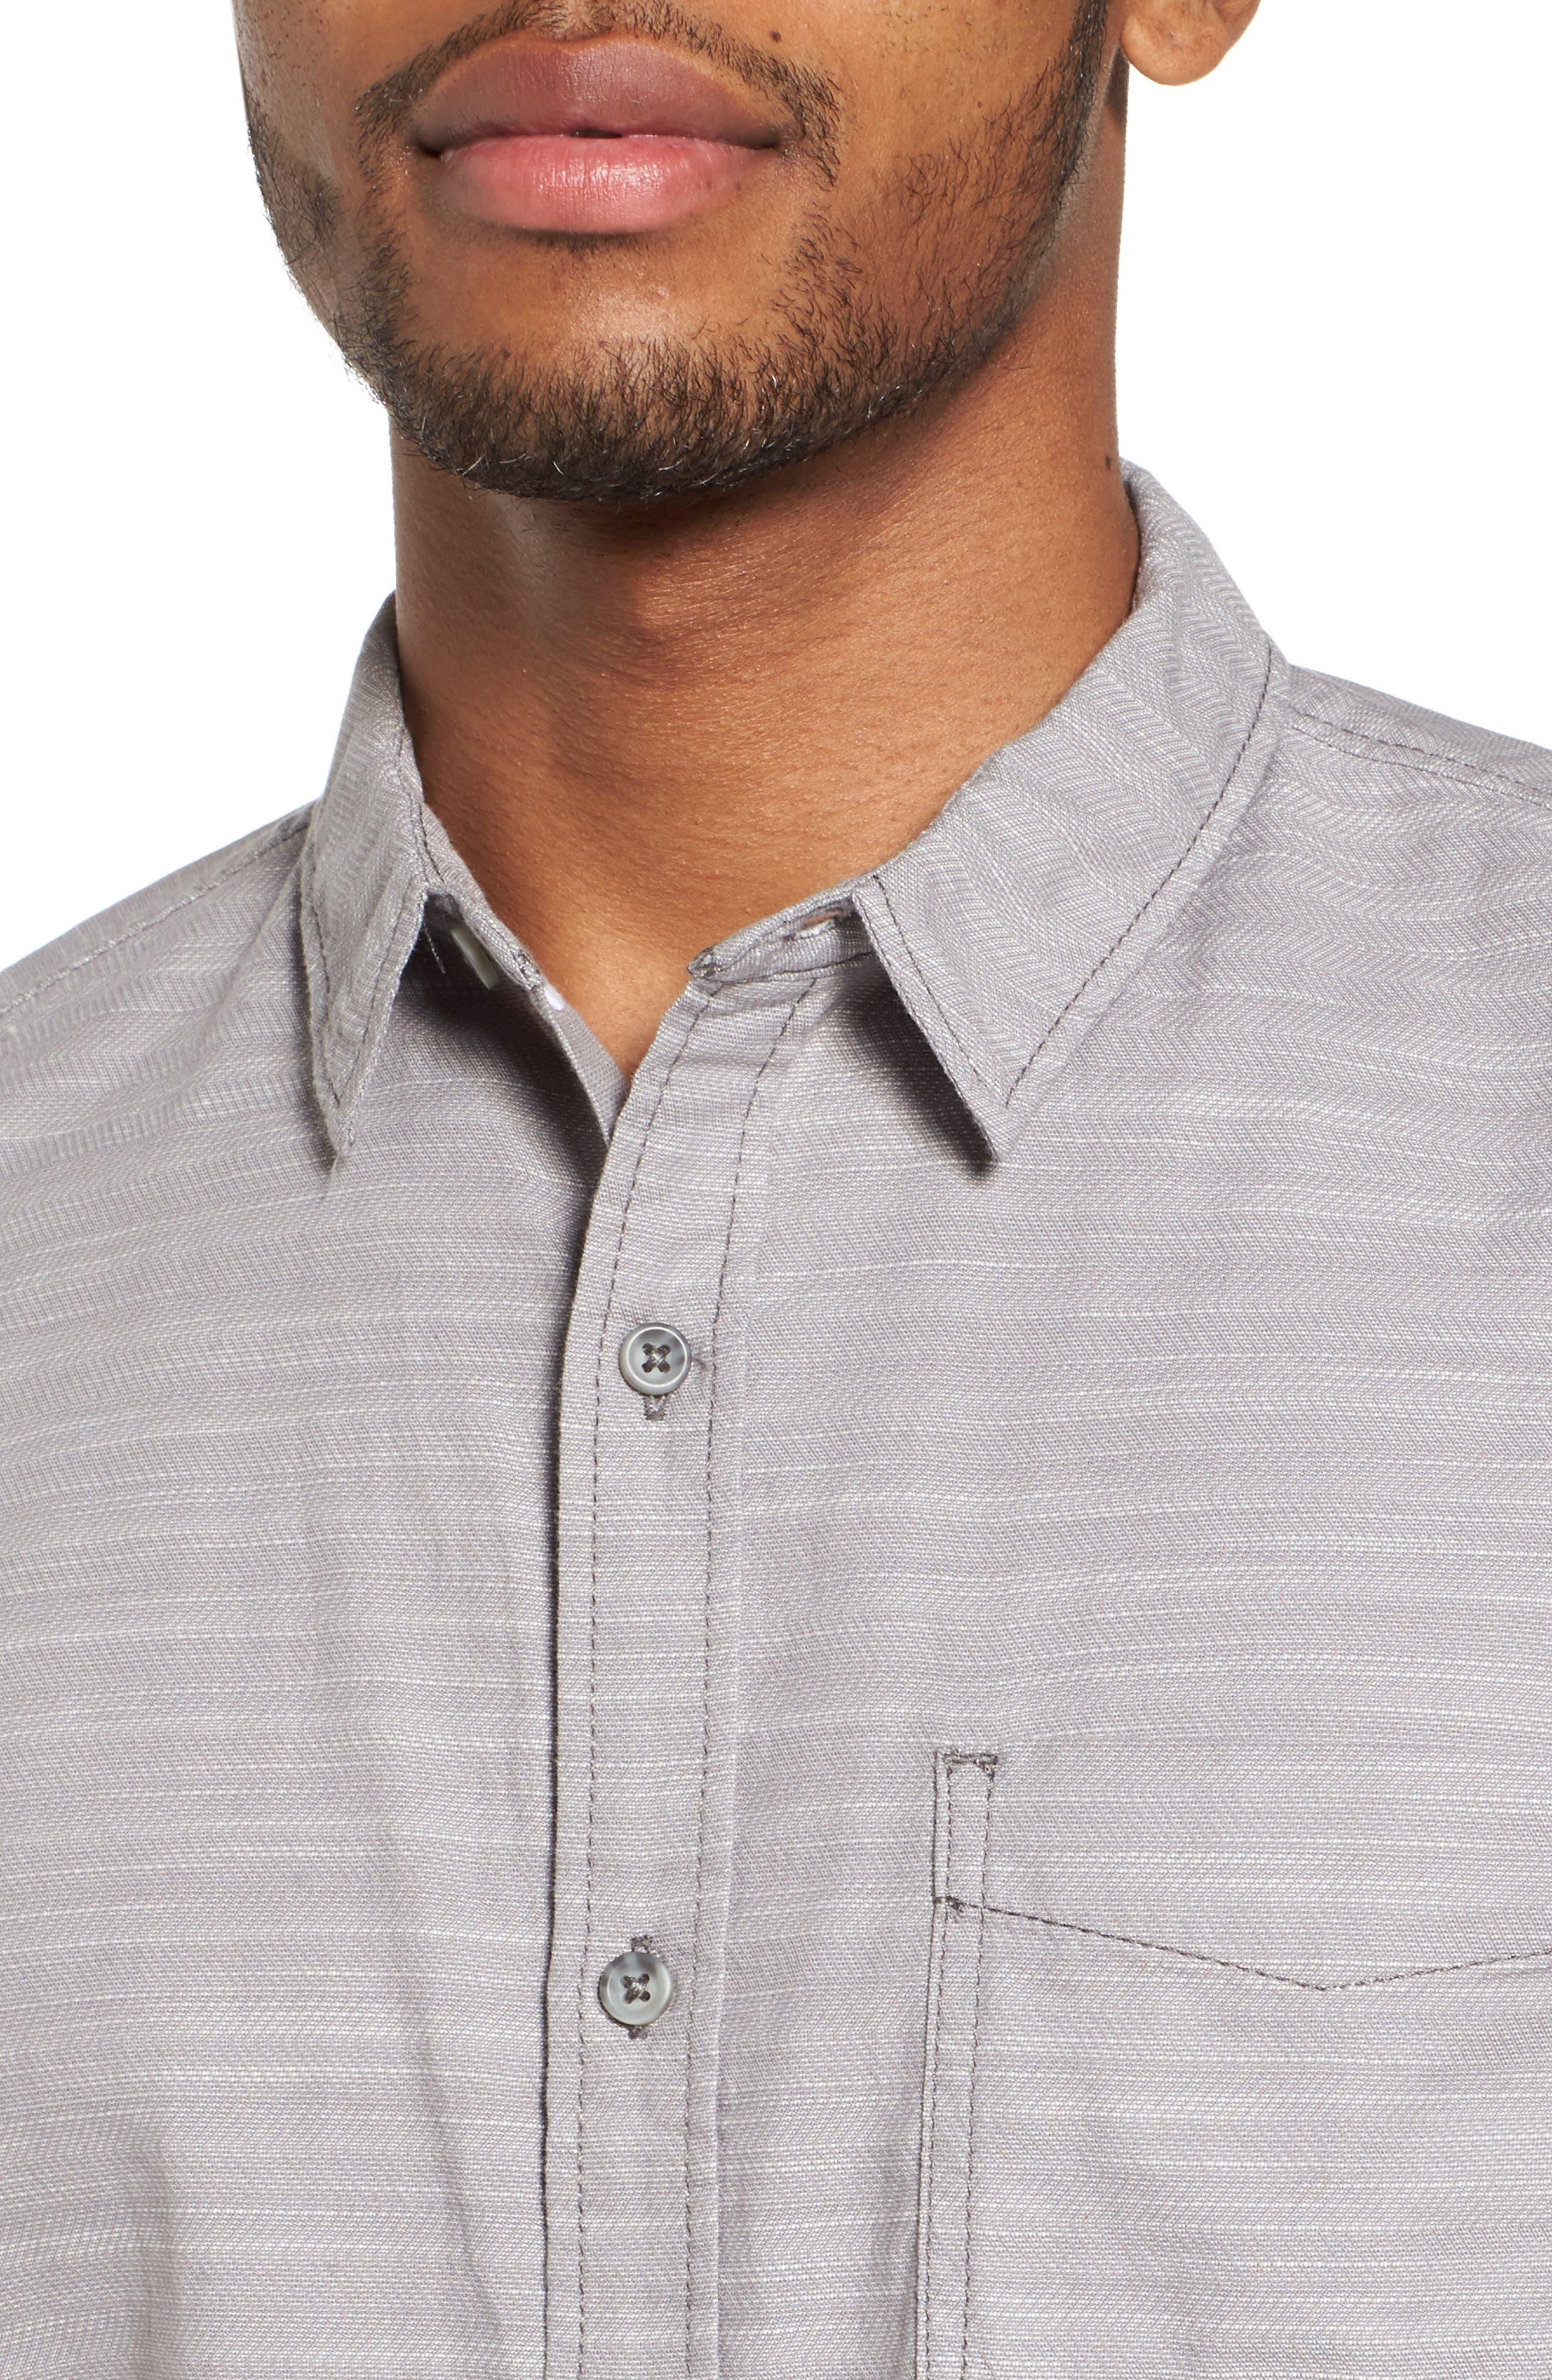 Herringbone Chambray Shirt,                             Alternate thumbnail 4, color,                             030